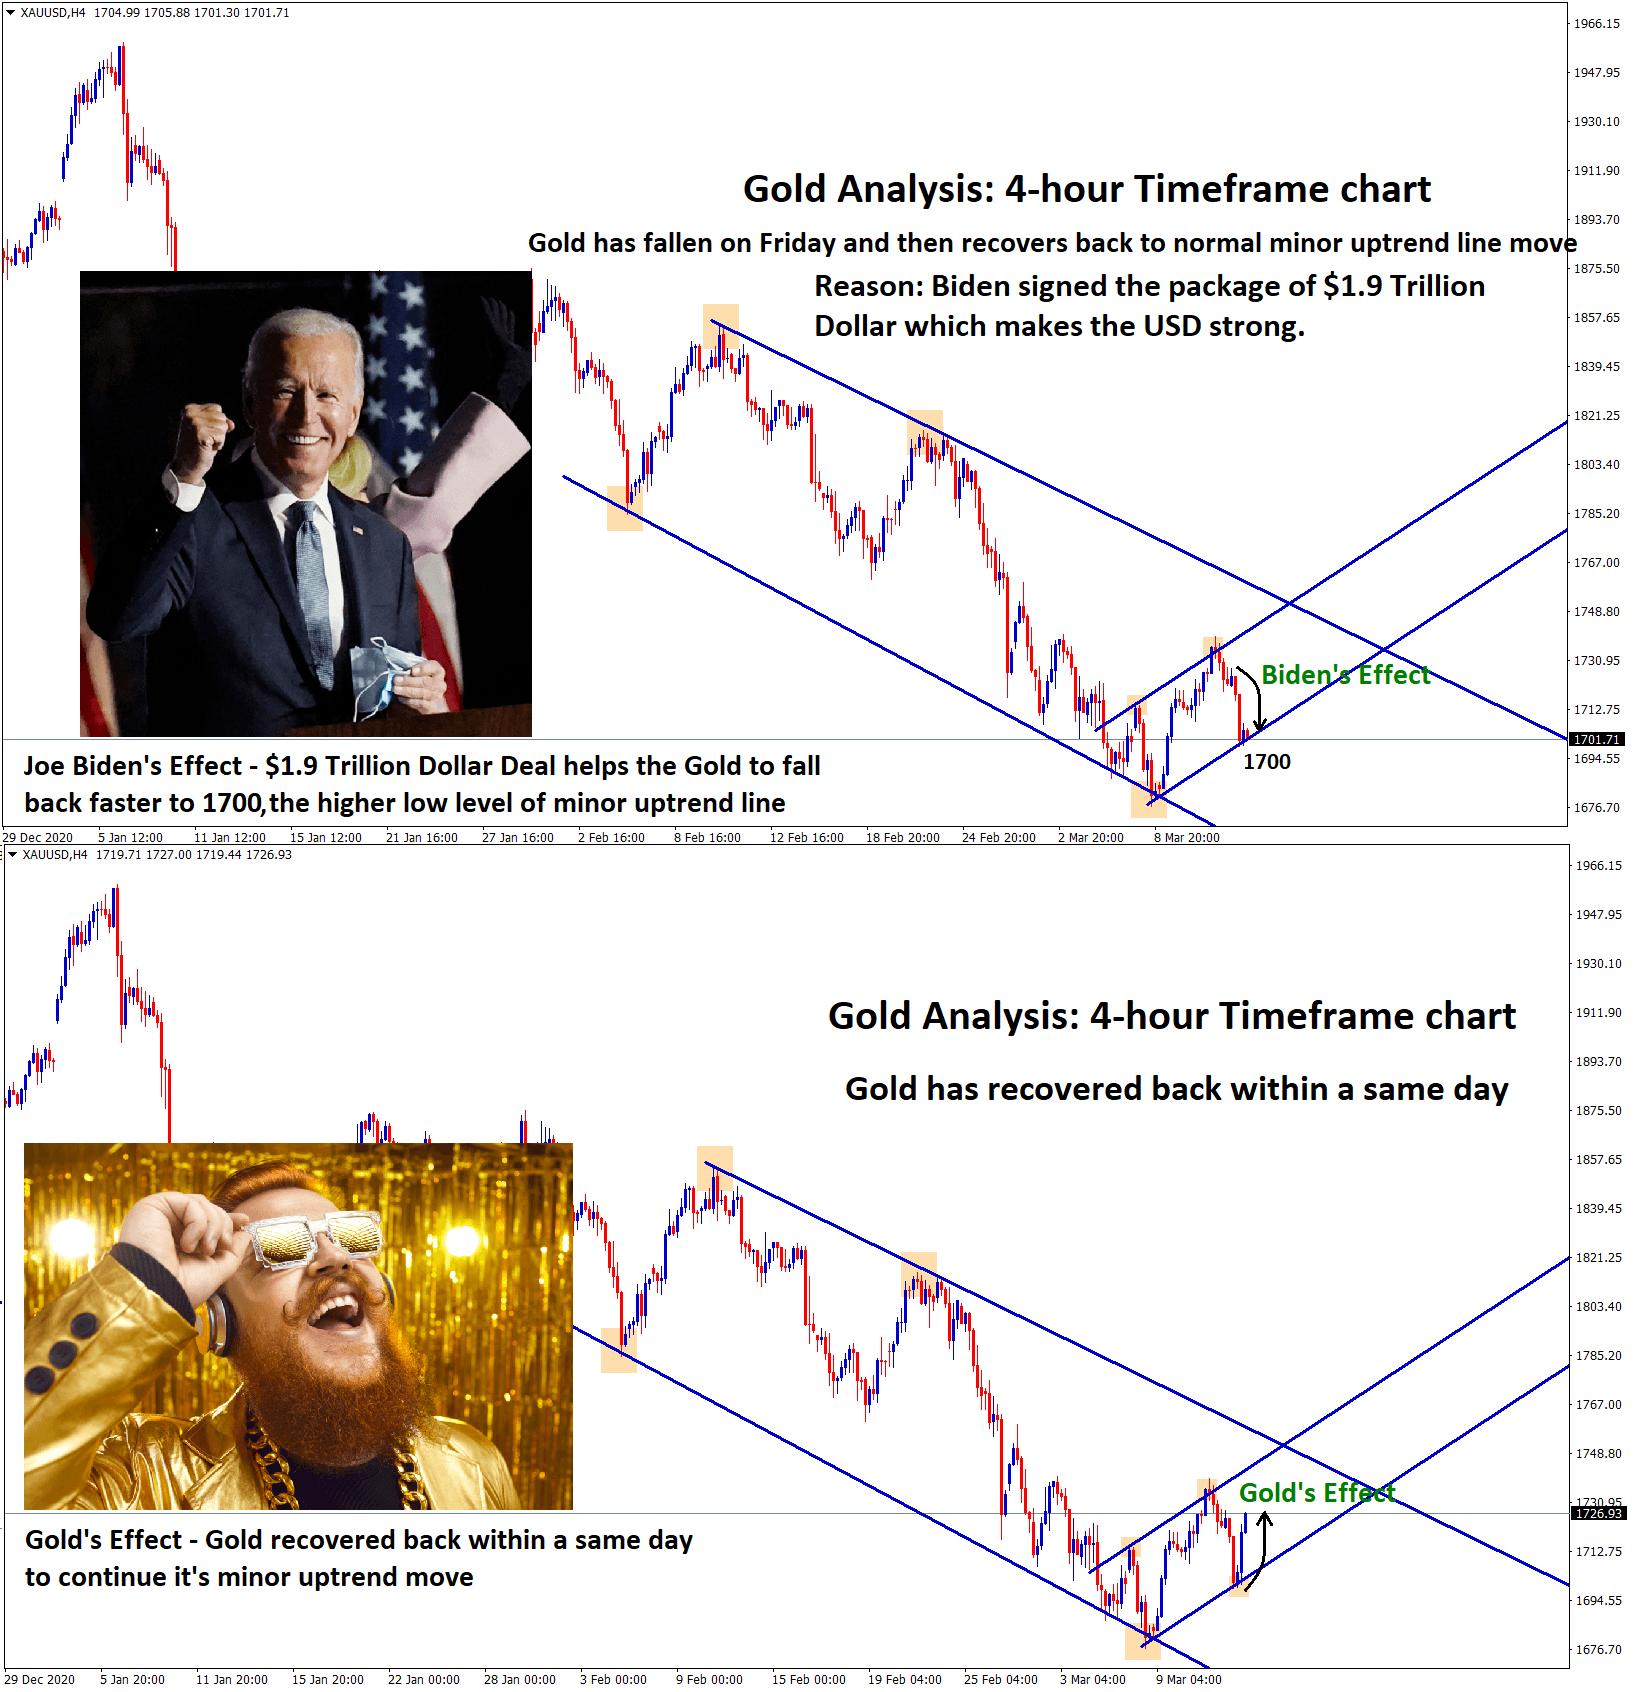 Gold Vs Bidens effect